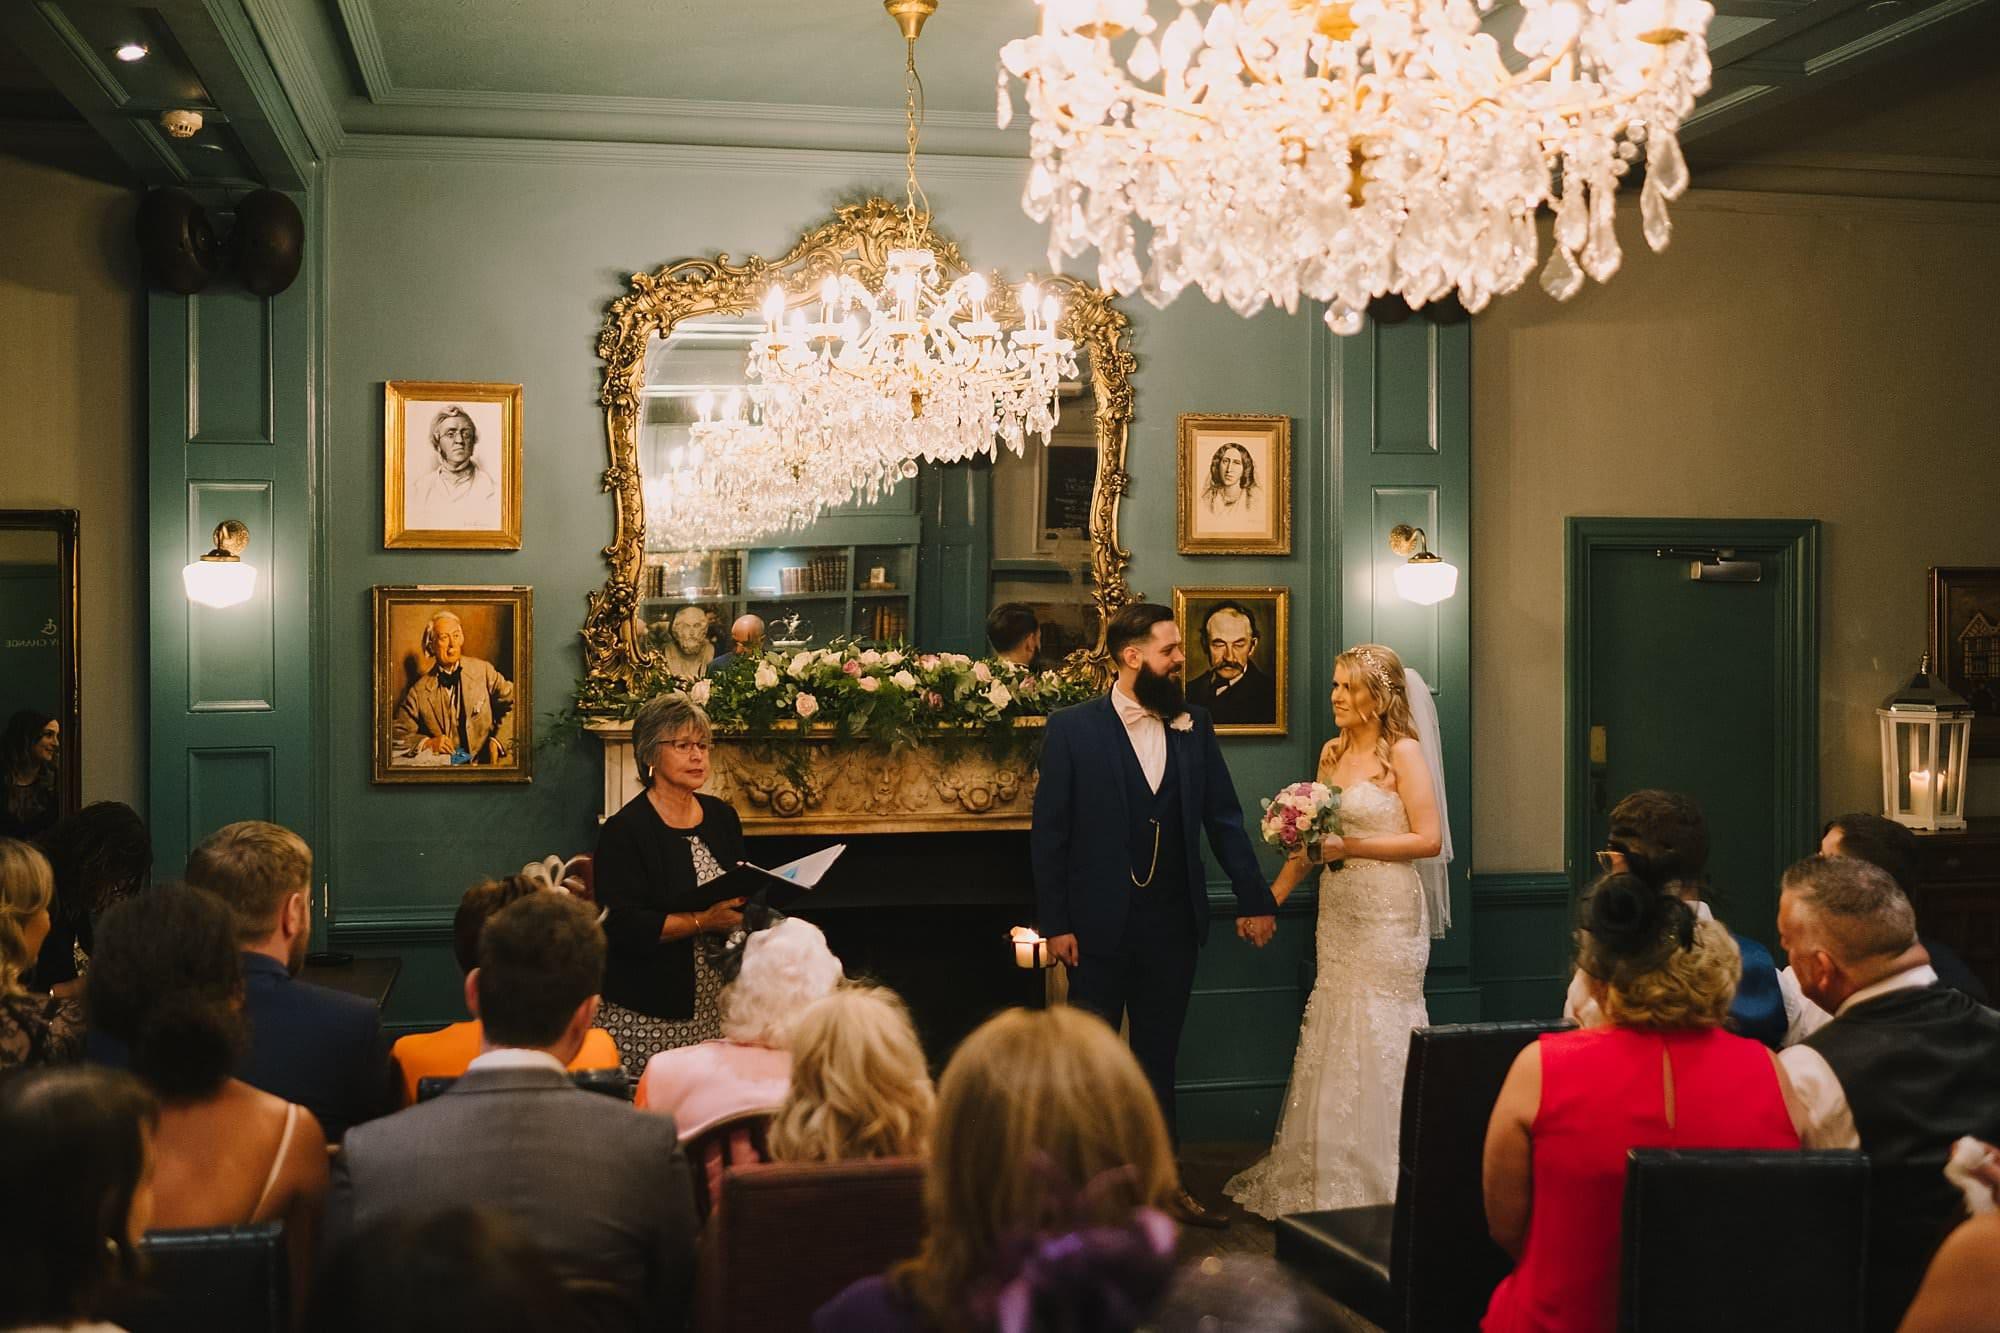 london pub wedding photographer jn 011 - The County Arms Wedding Photographer   Jen & Nick